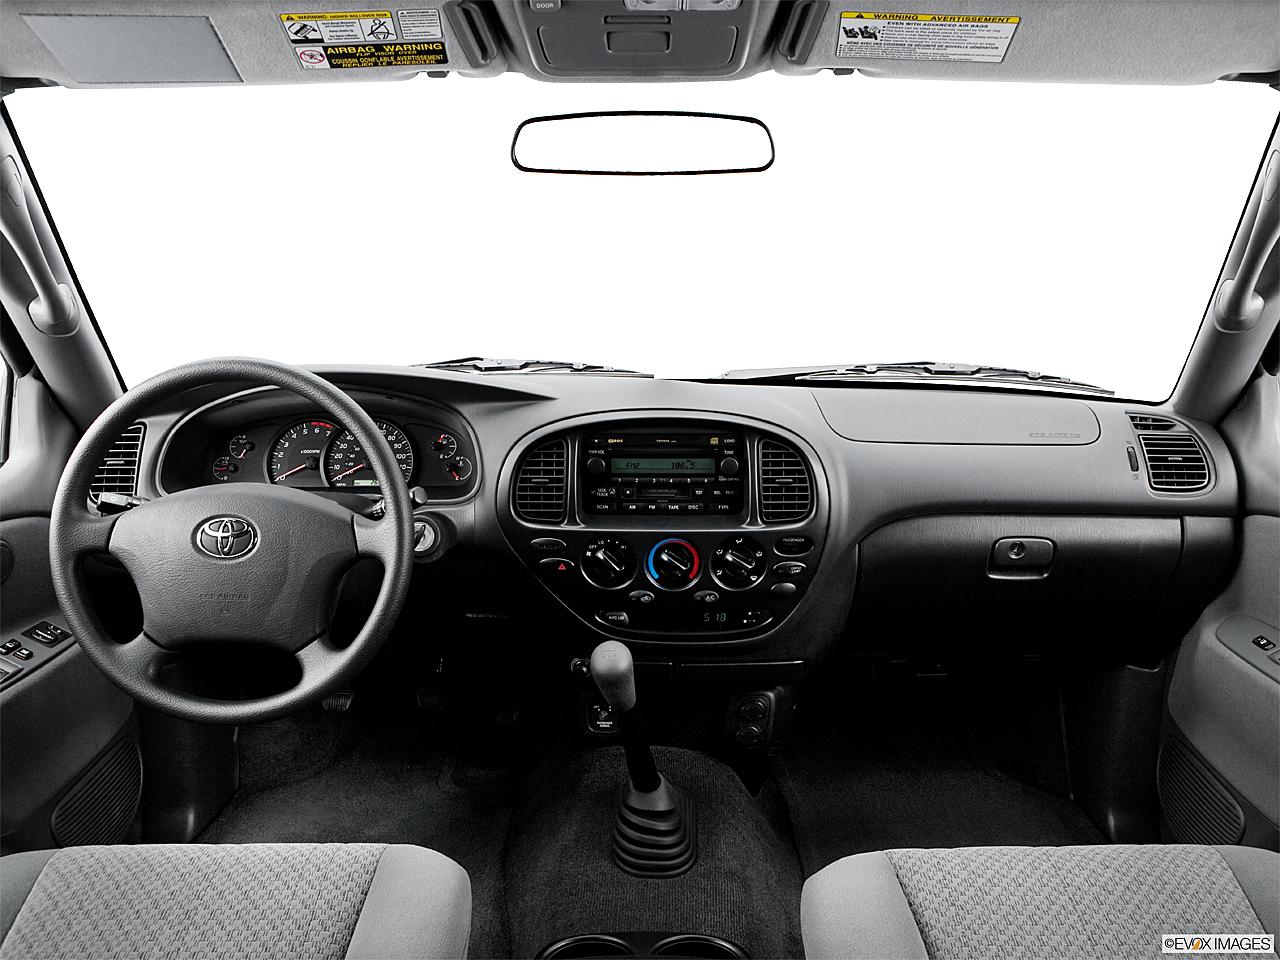 Pontiac Vibe 20032004 88969666 Control Module Cruise Control